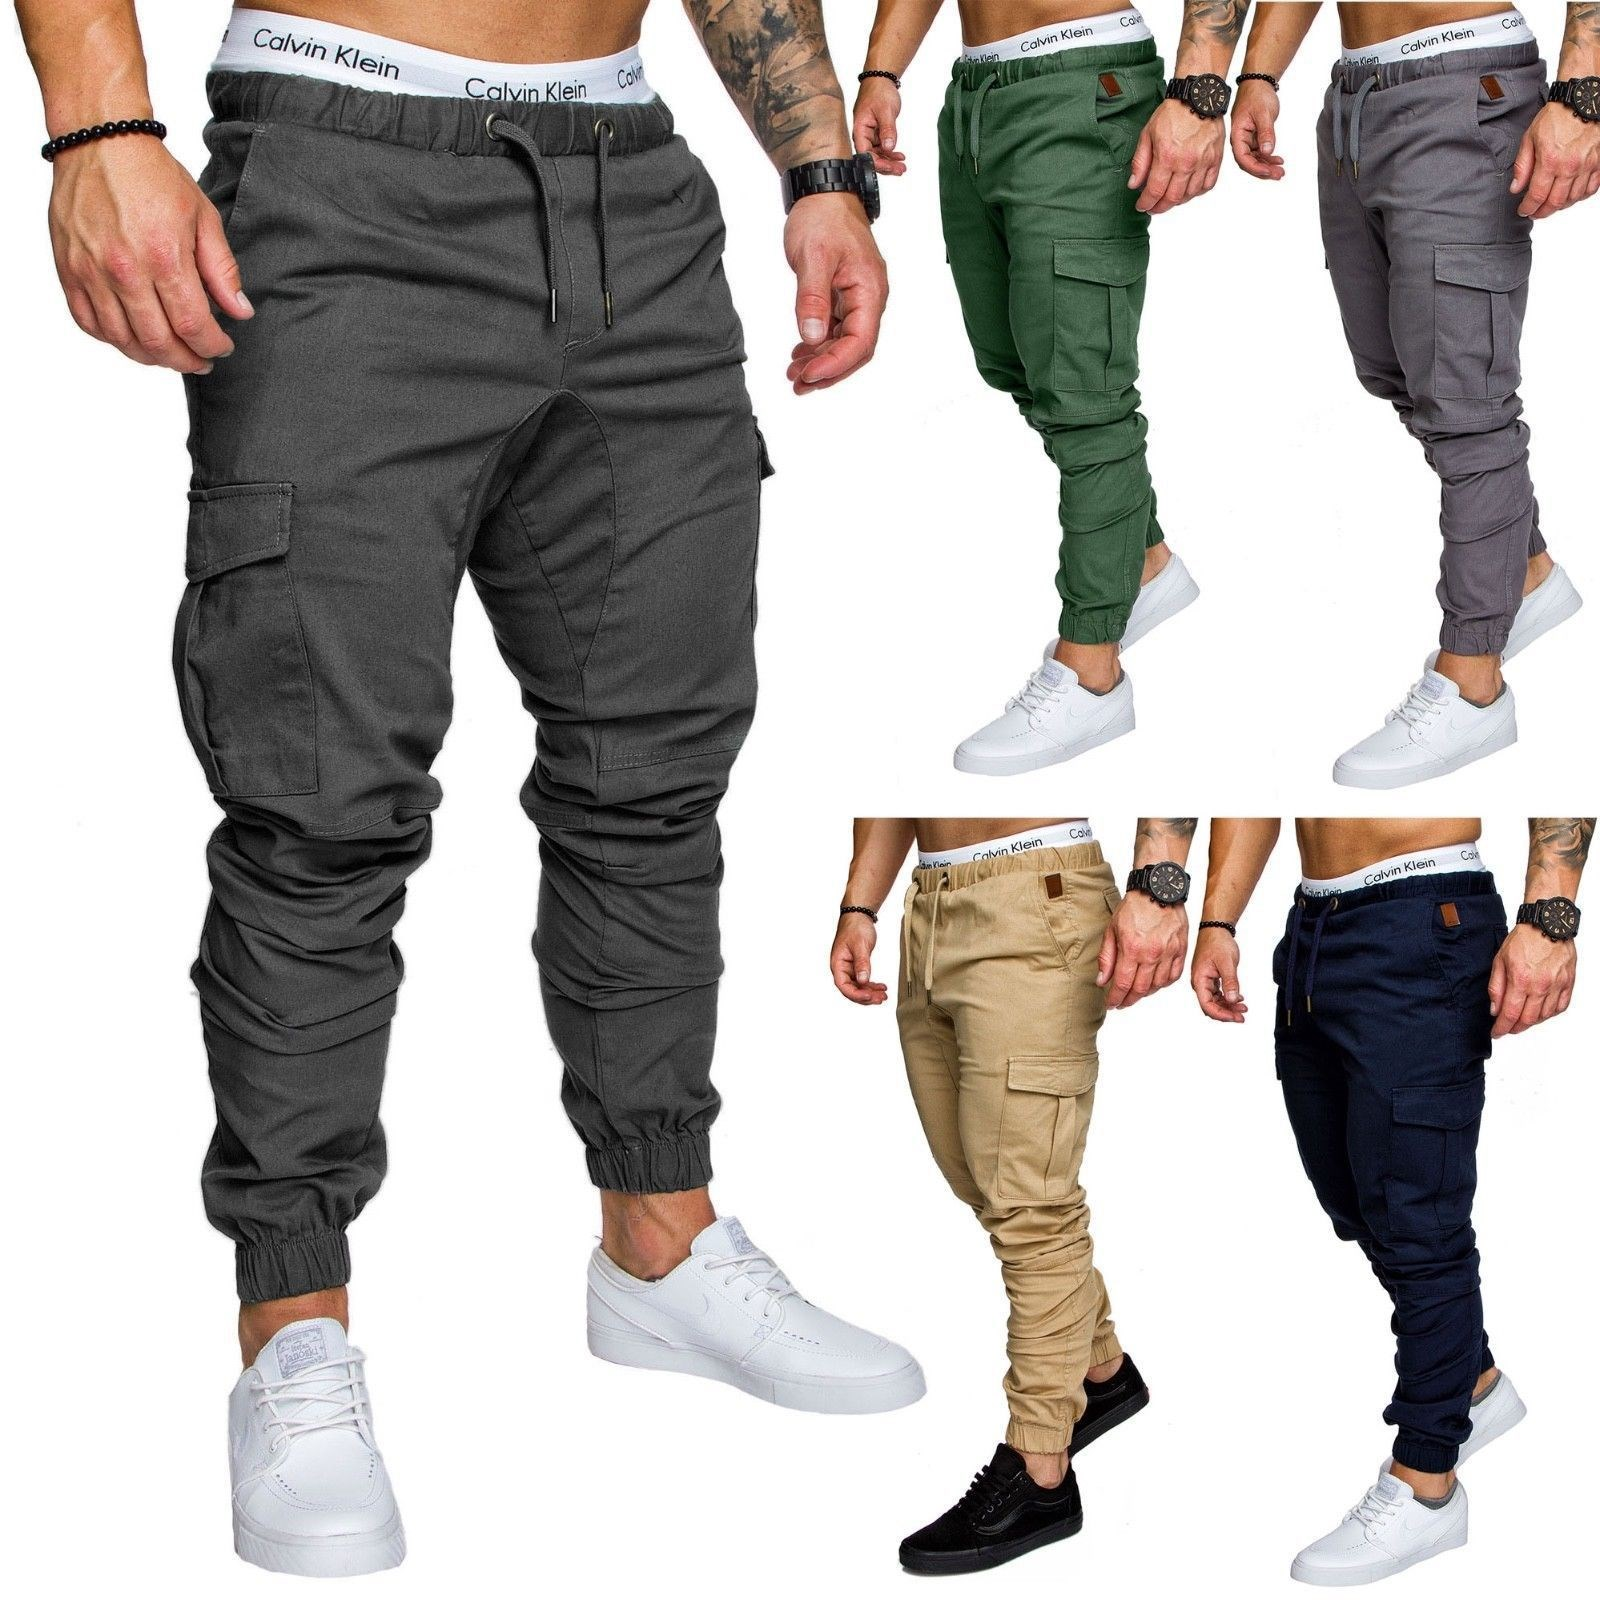 Men pocket casual pants stretch pants youth sport pants 男裤